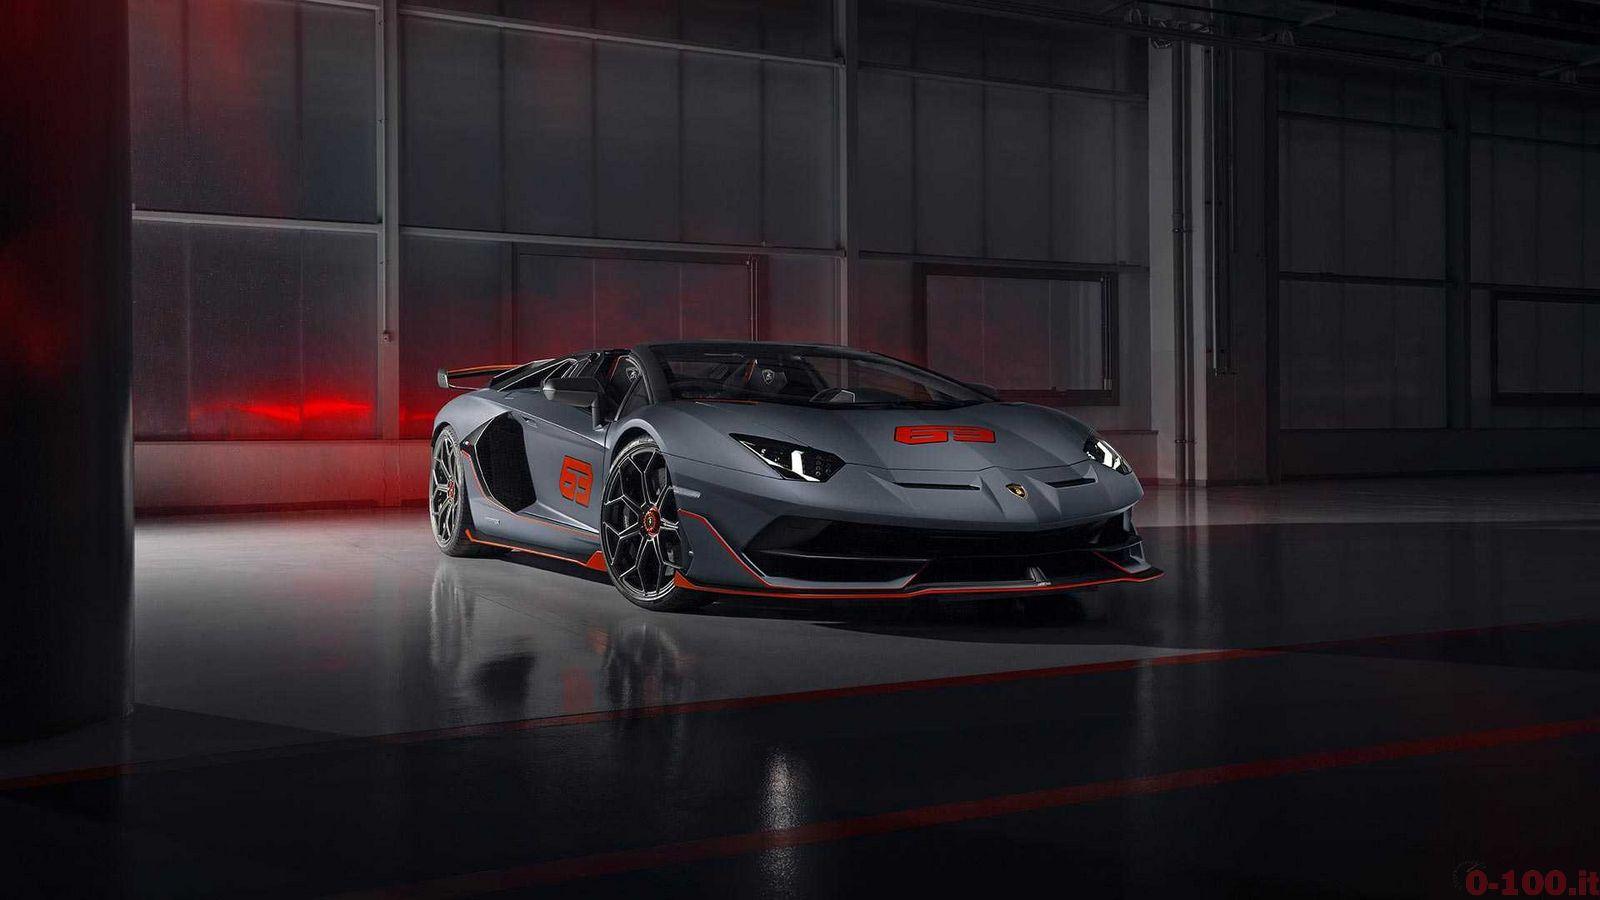 Lamborghini_Aventador_SVJ_63_Roadster_0-100_2